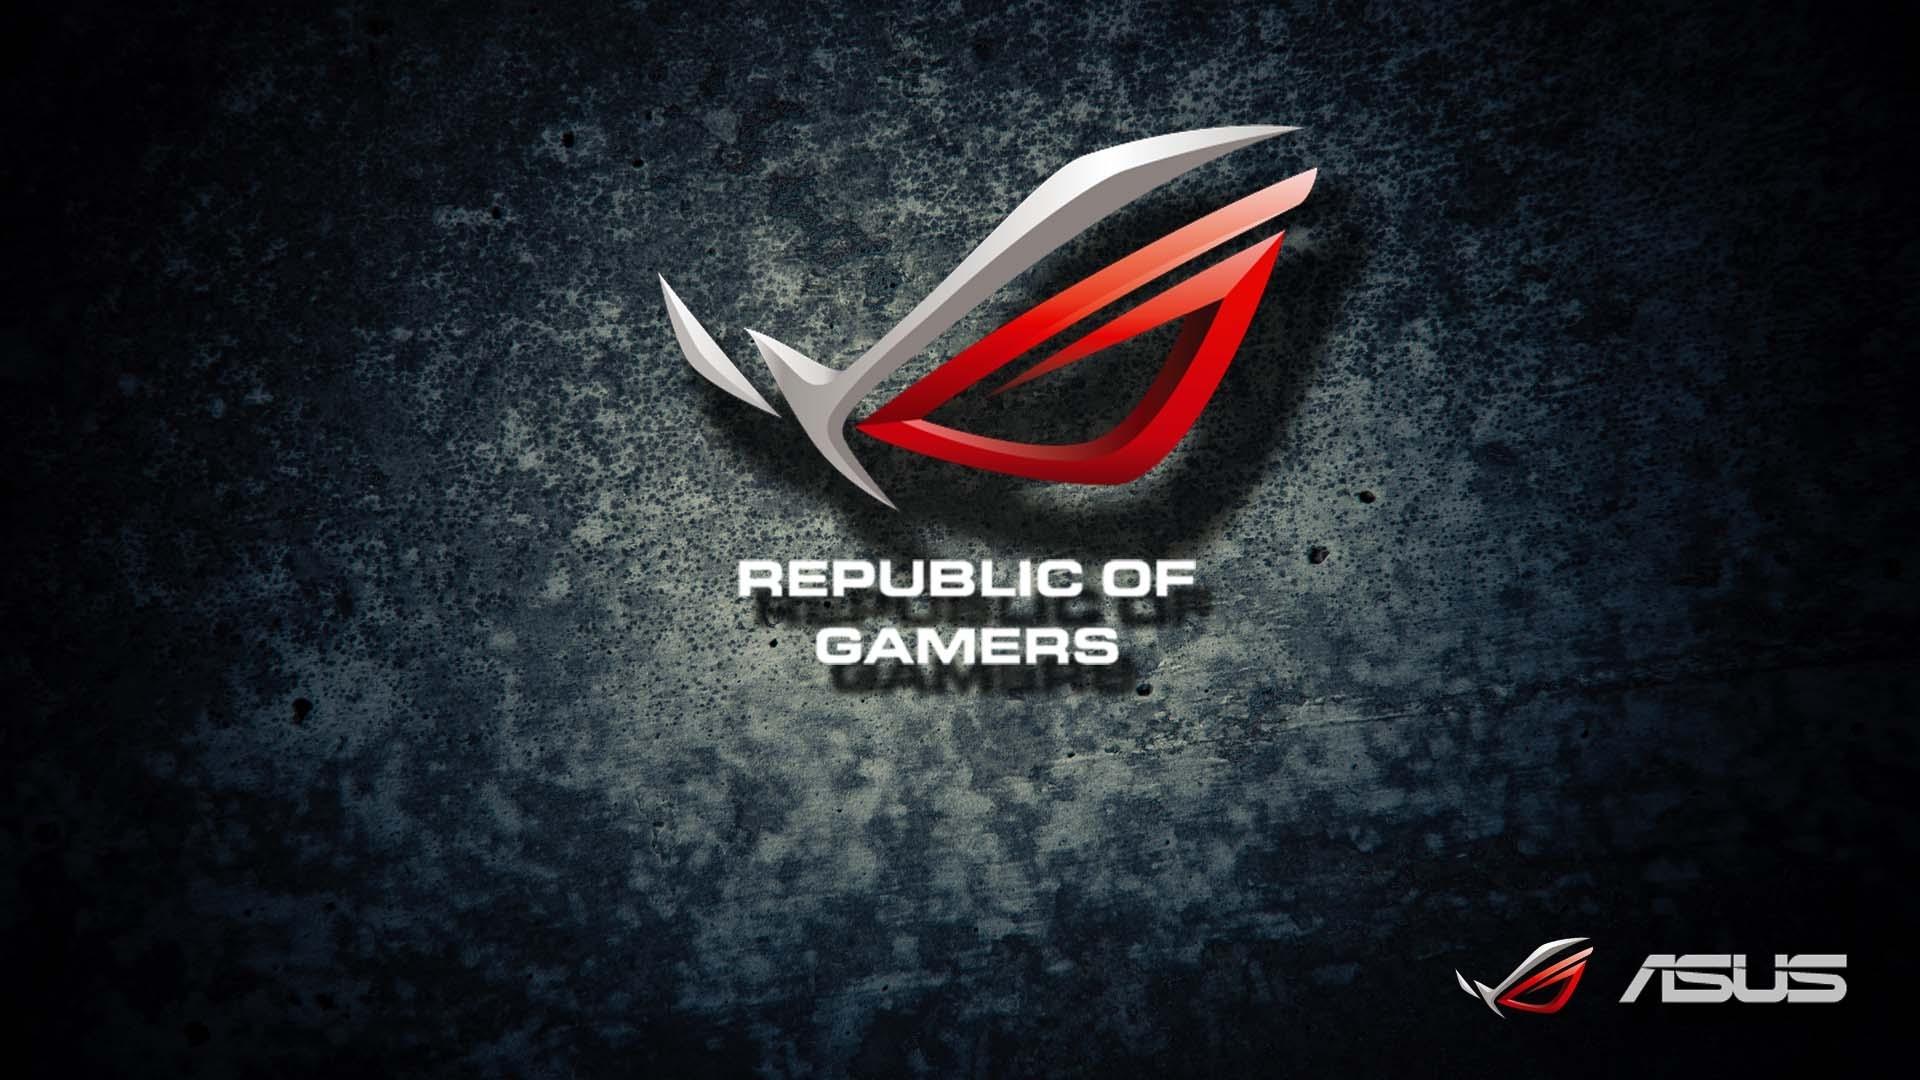 republic-of-gamers-wallpapers - wallpaper.wiki